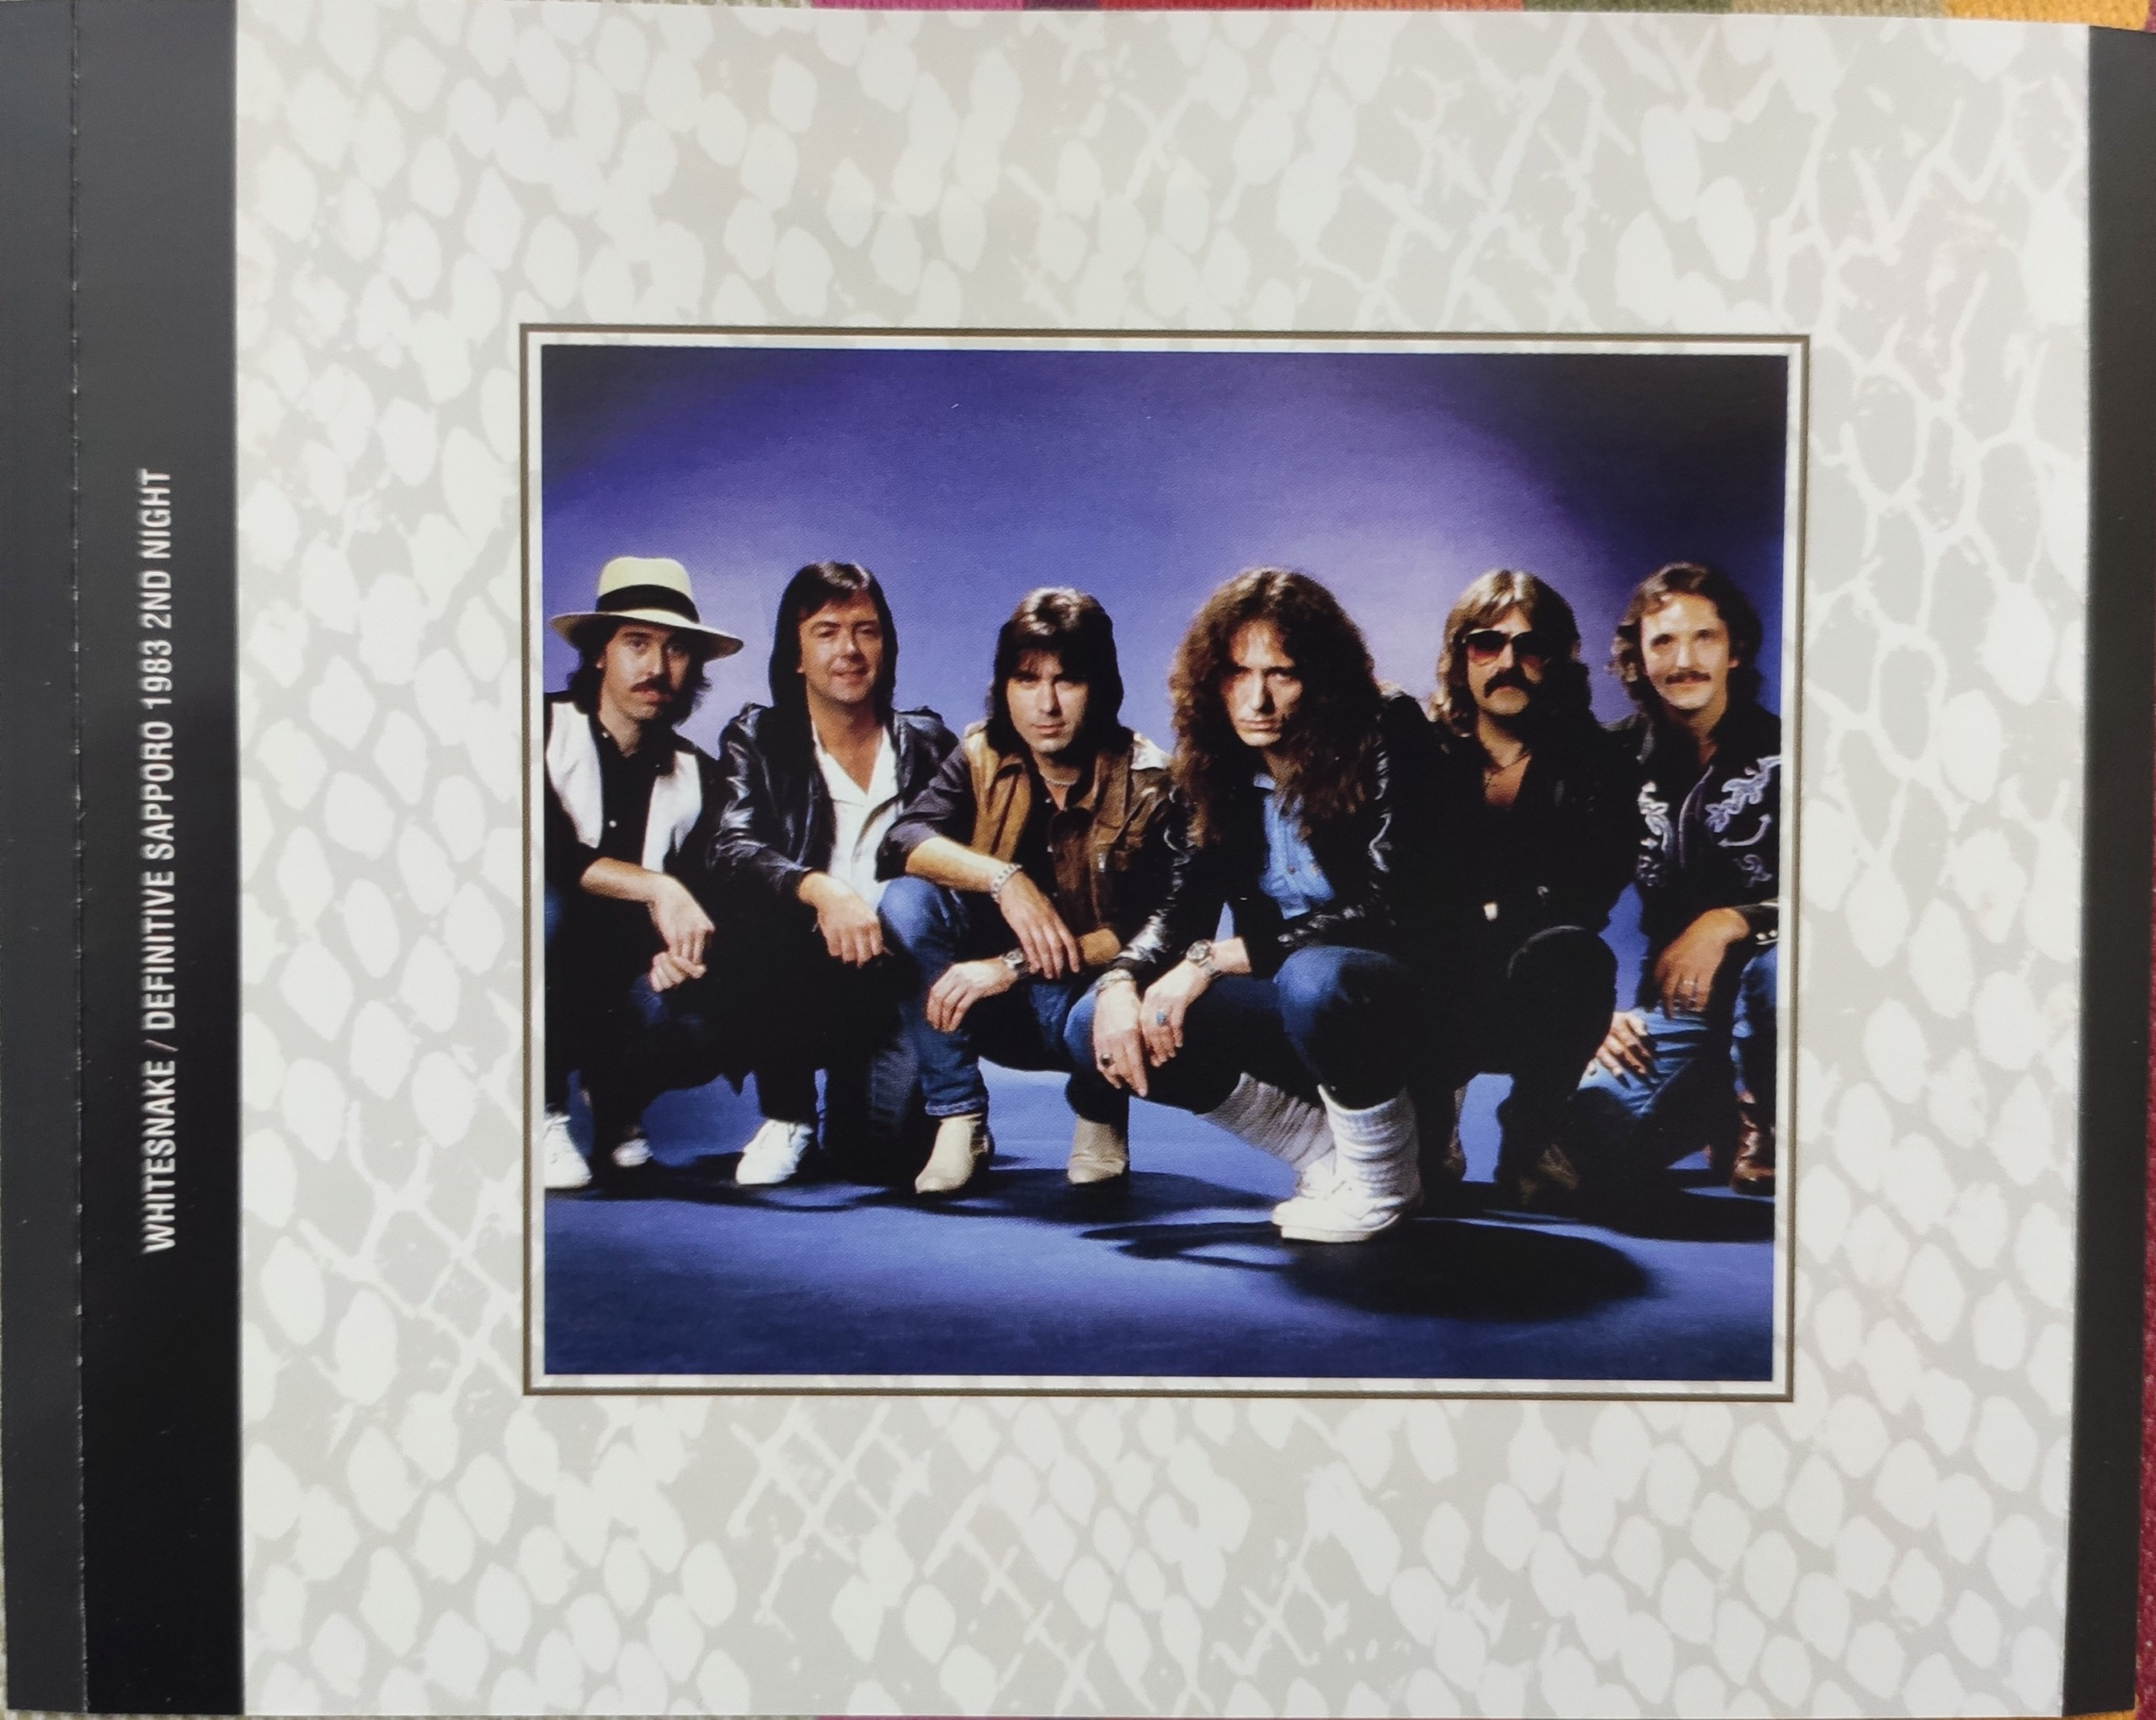 vos bootlegs Whitesnake - Page 3 Img_2253